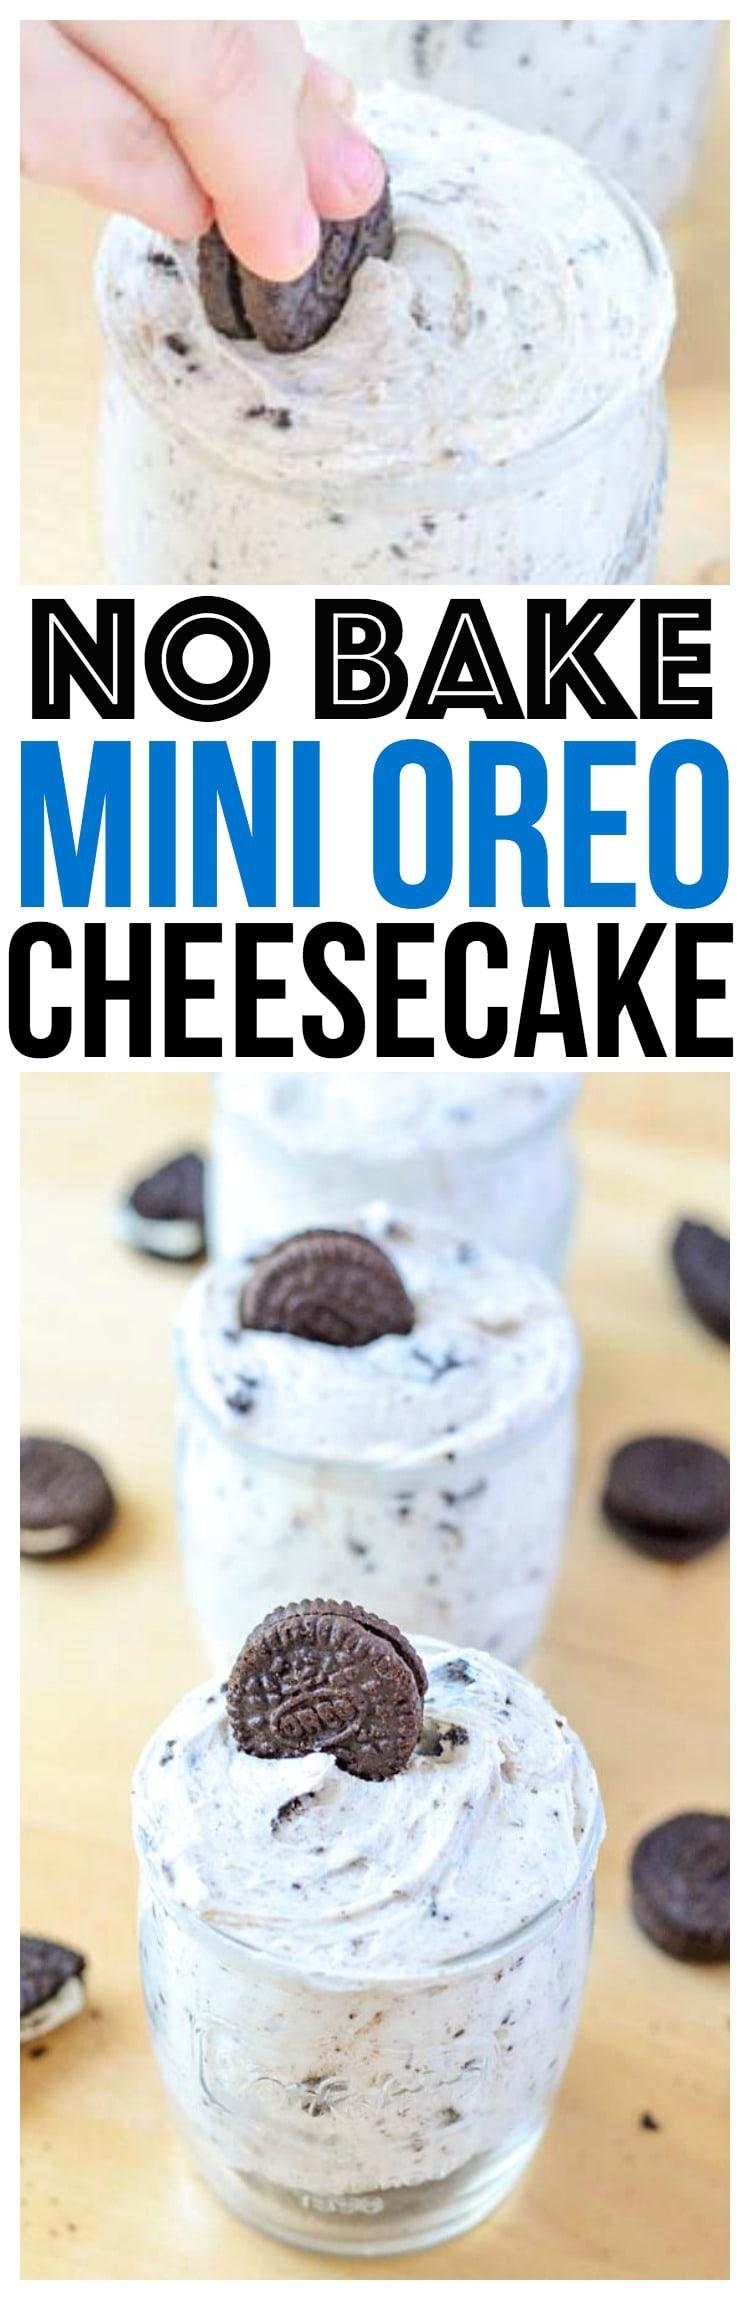 no bake oreo cheesecake easy dessert recipe one of our favorite cheesecake recipes and no bake oreo dessert